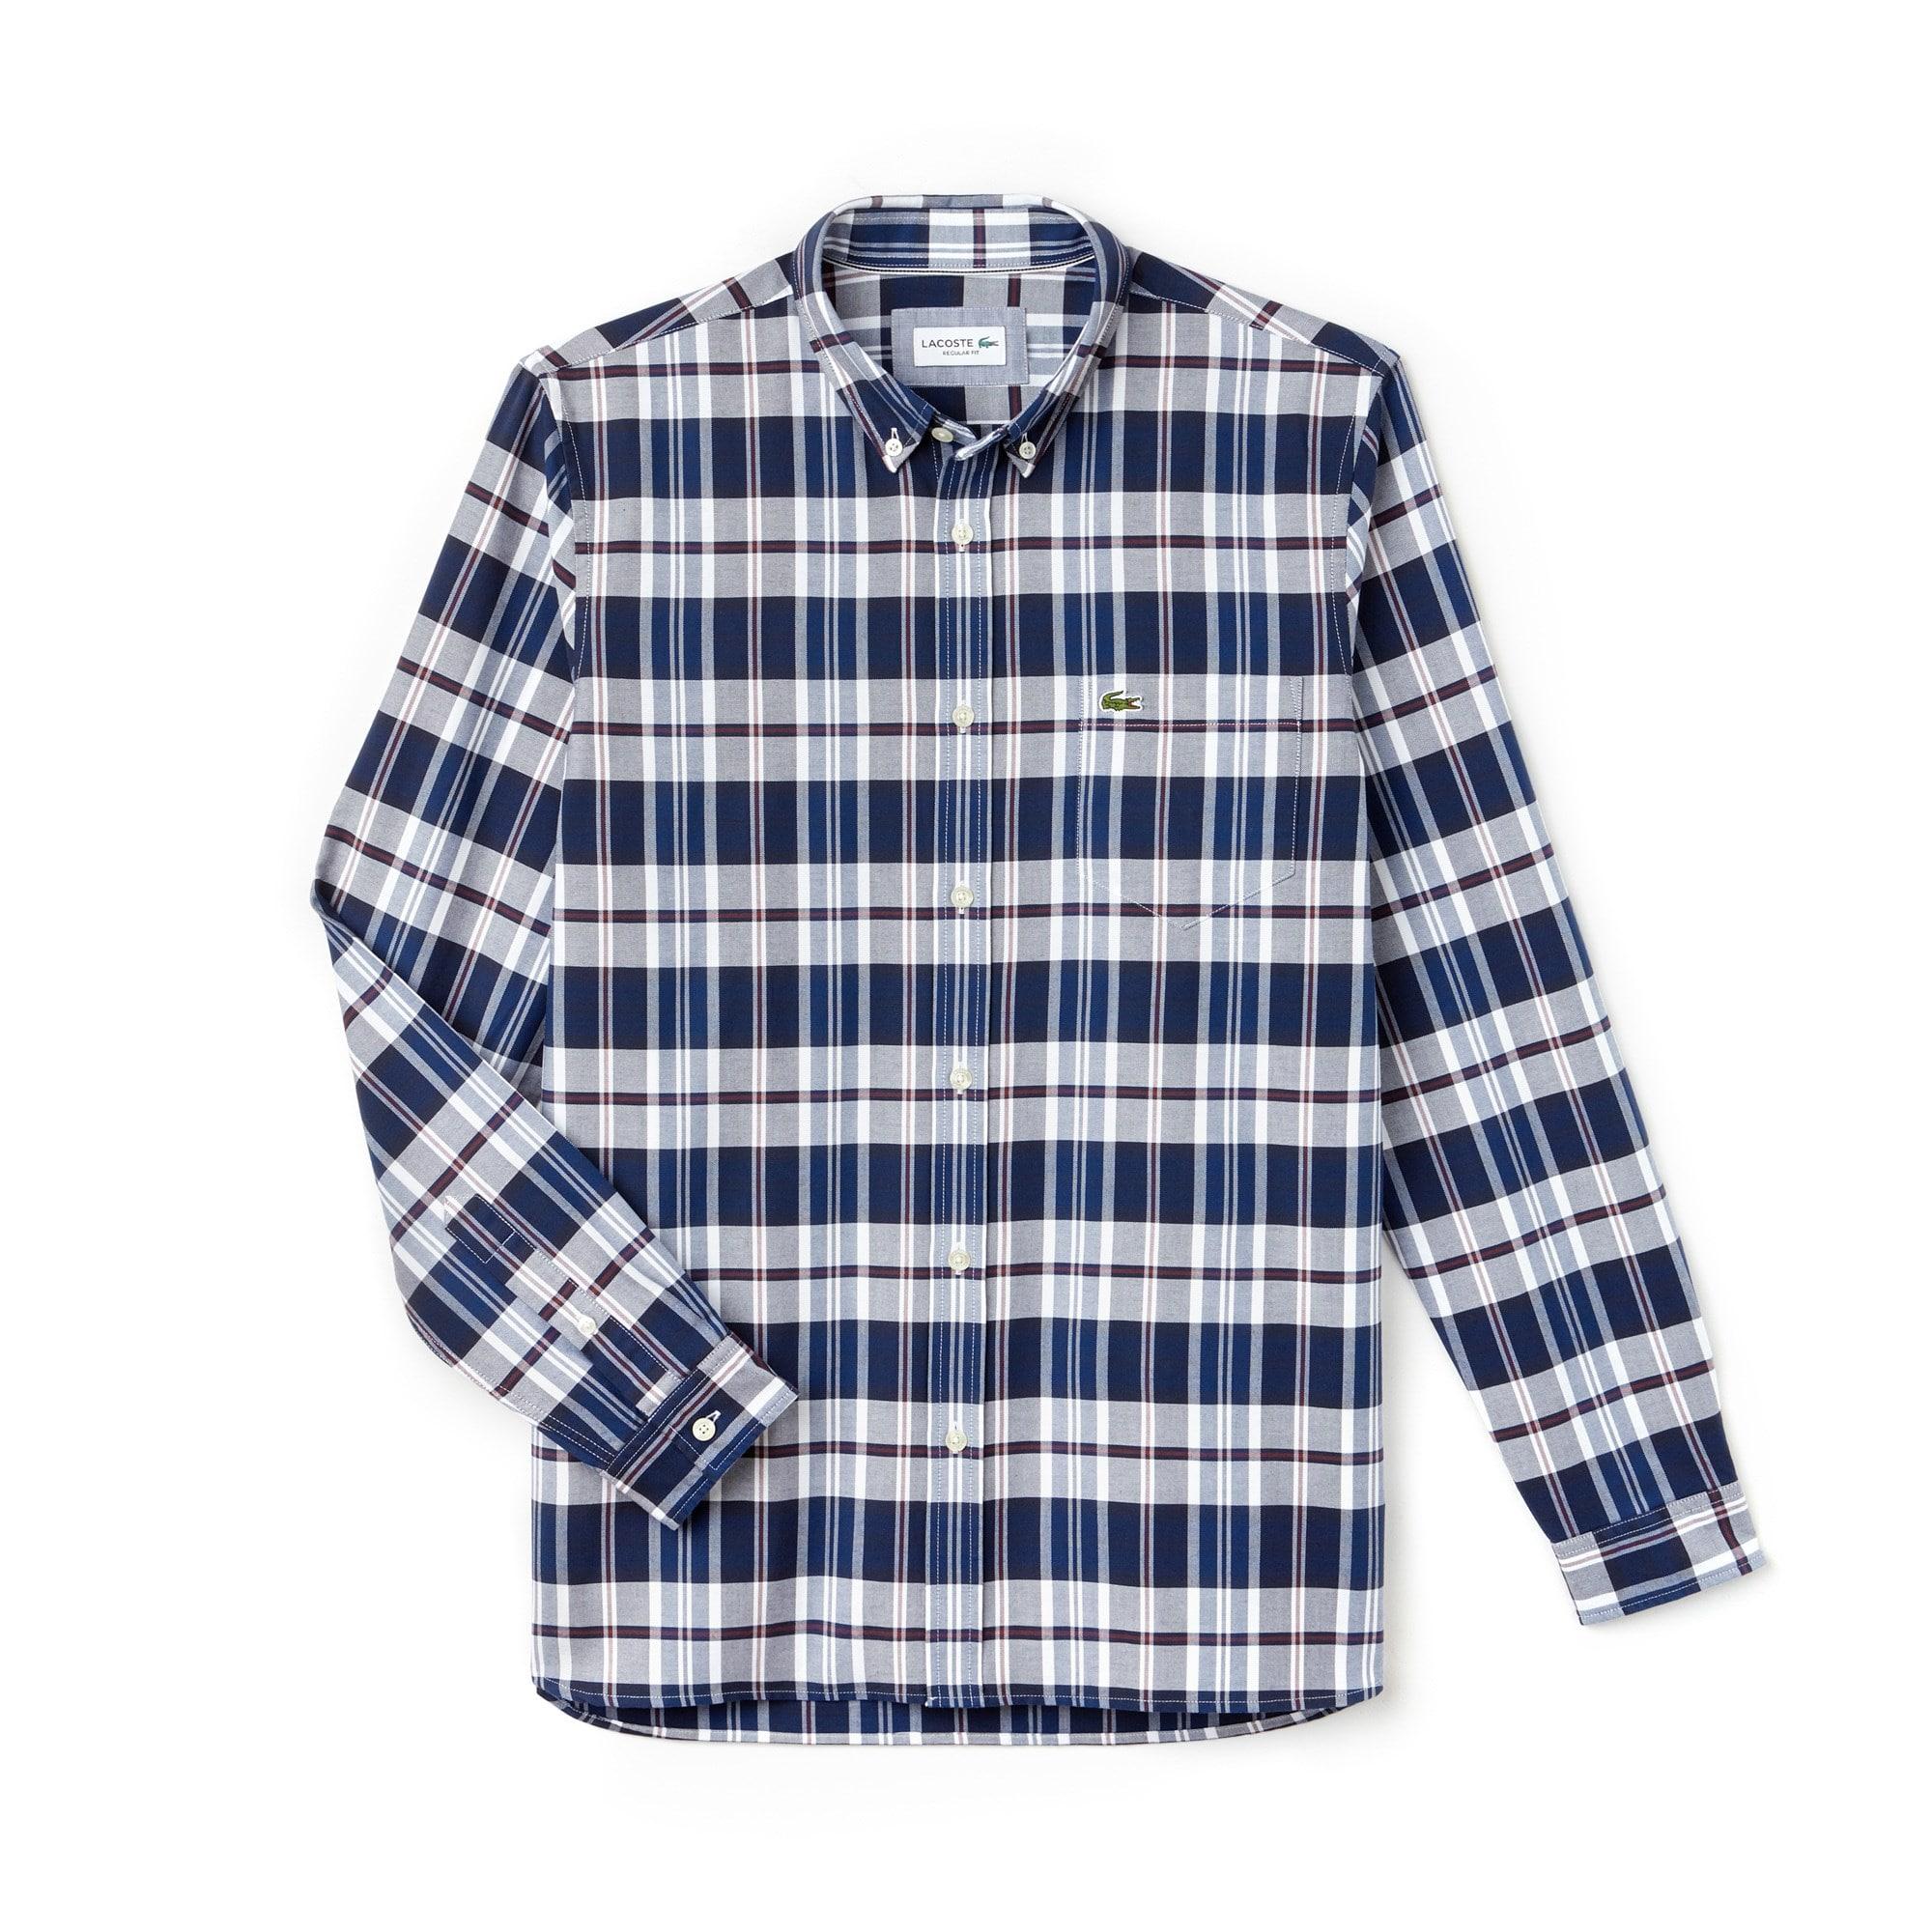 Chemises Fit Lacoste Regular Chemises Lacoste Fit Regular qtvwH6xwZR